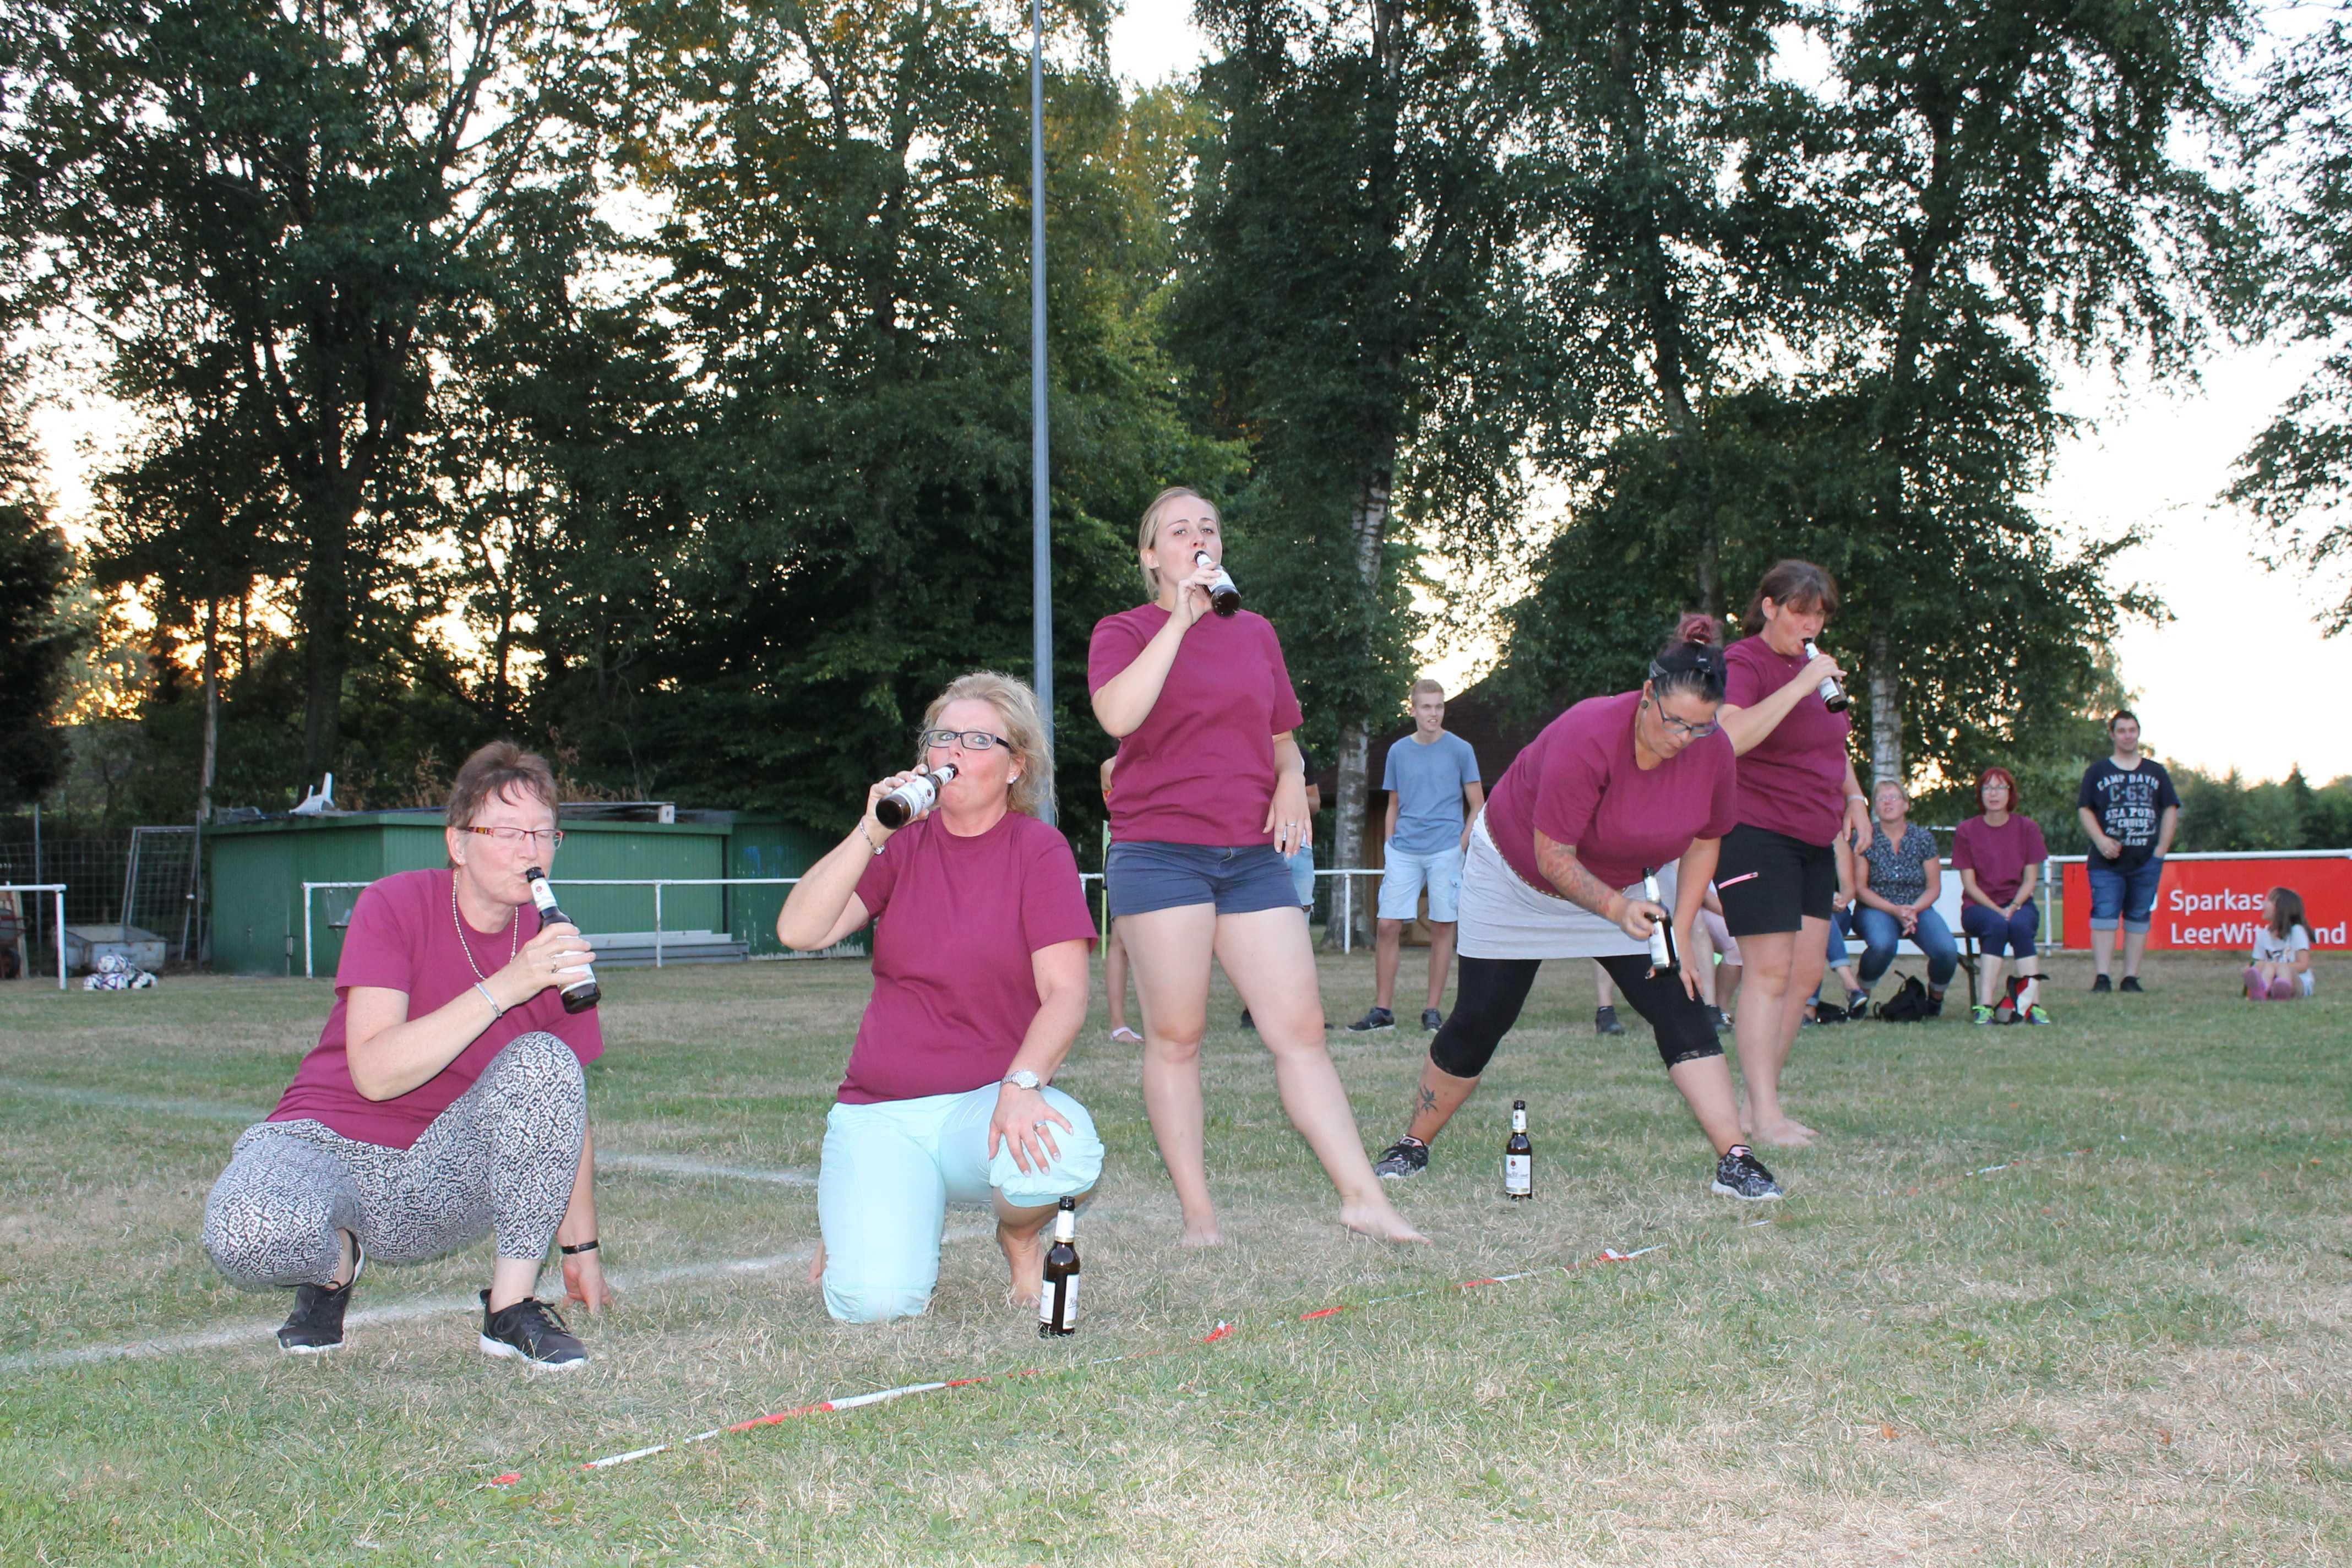 2018-07-27 Sportwoche - Flunkyball Turnier (60)